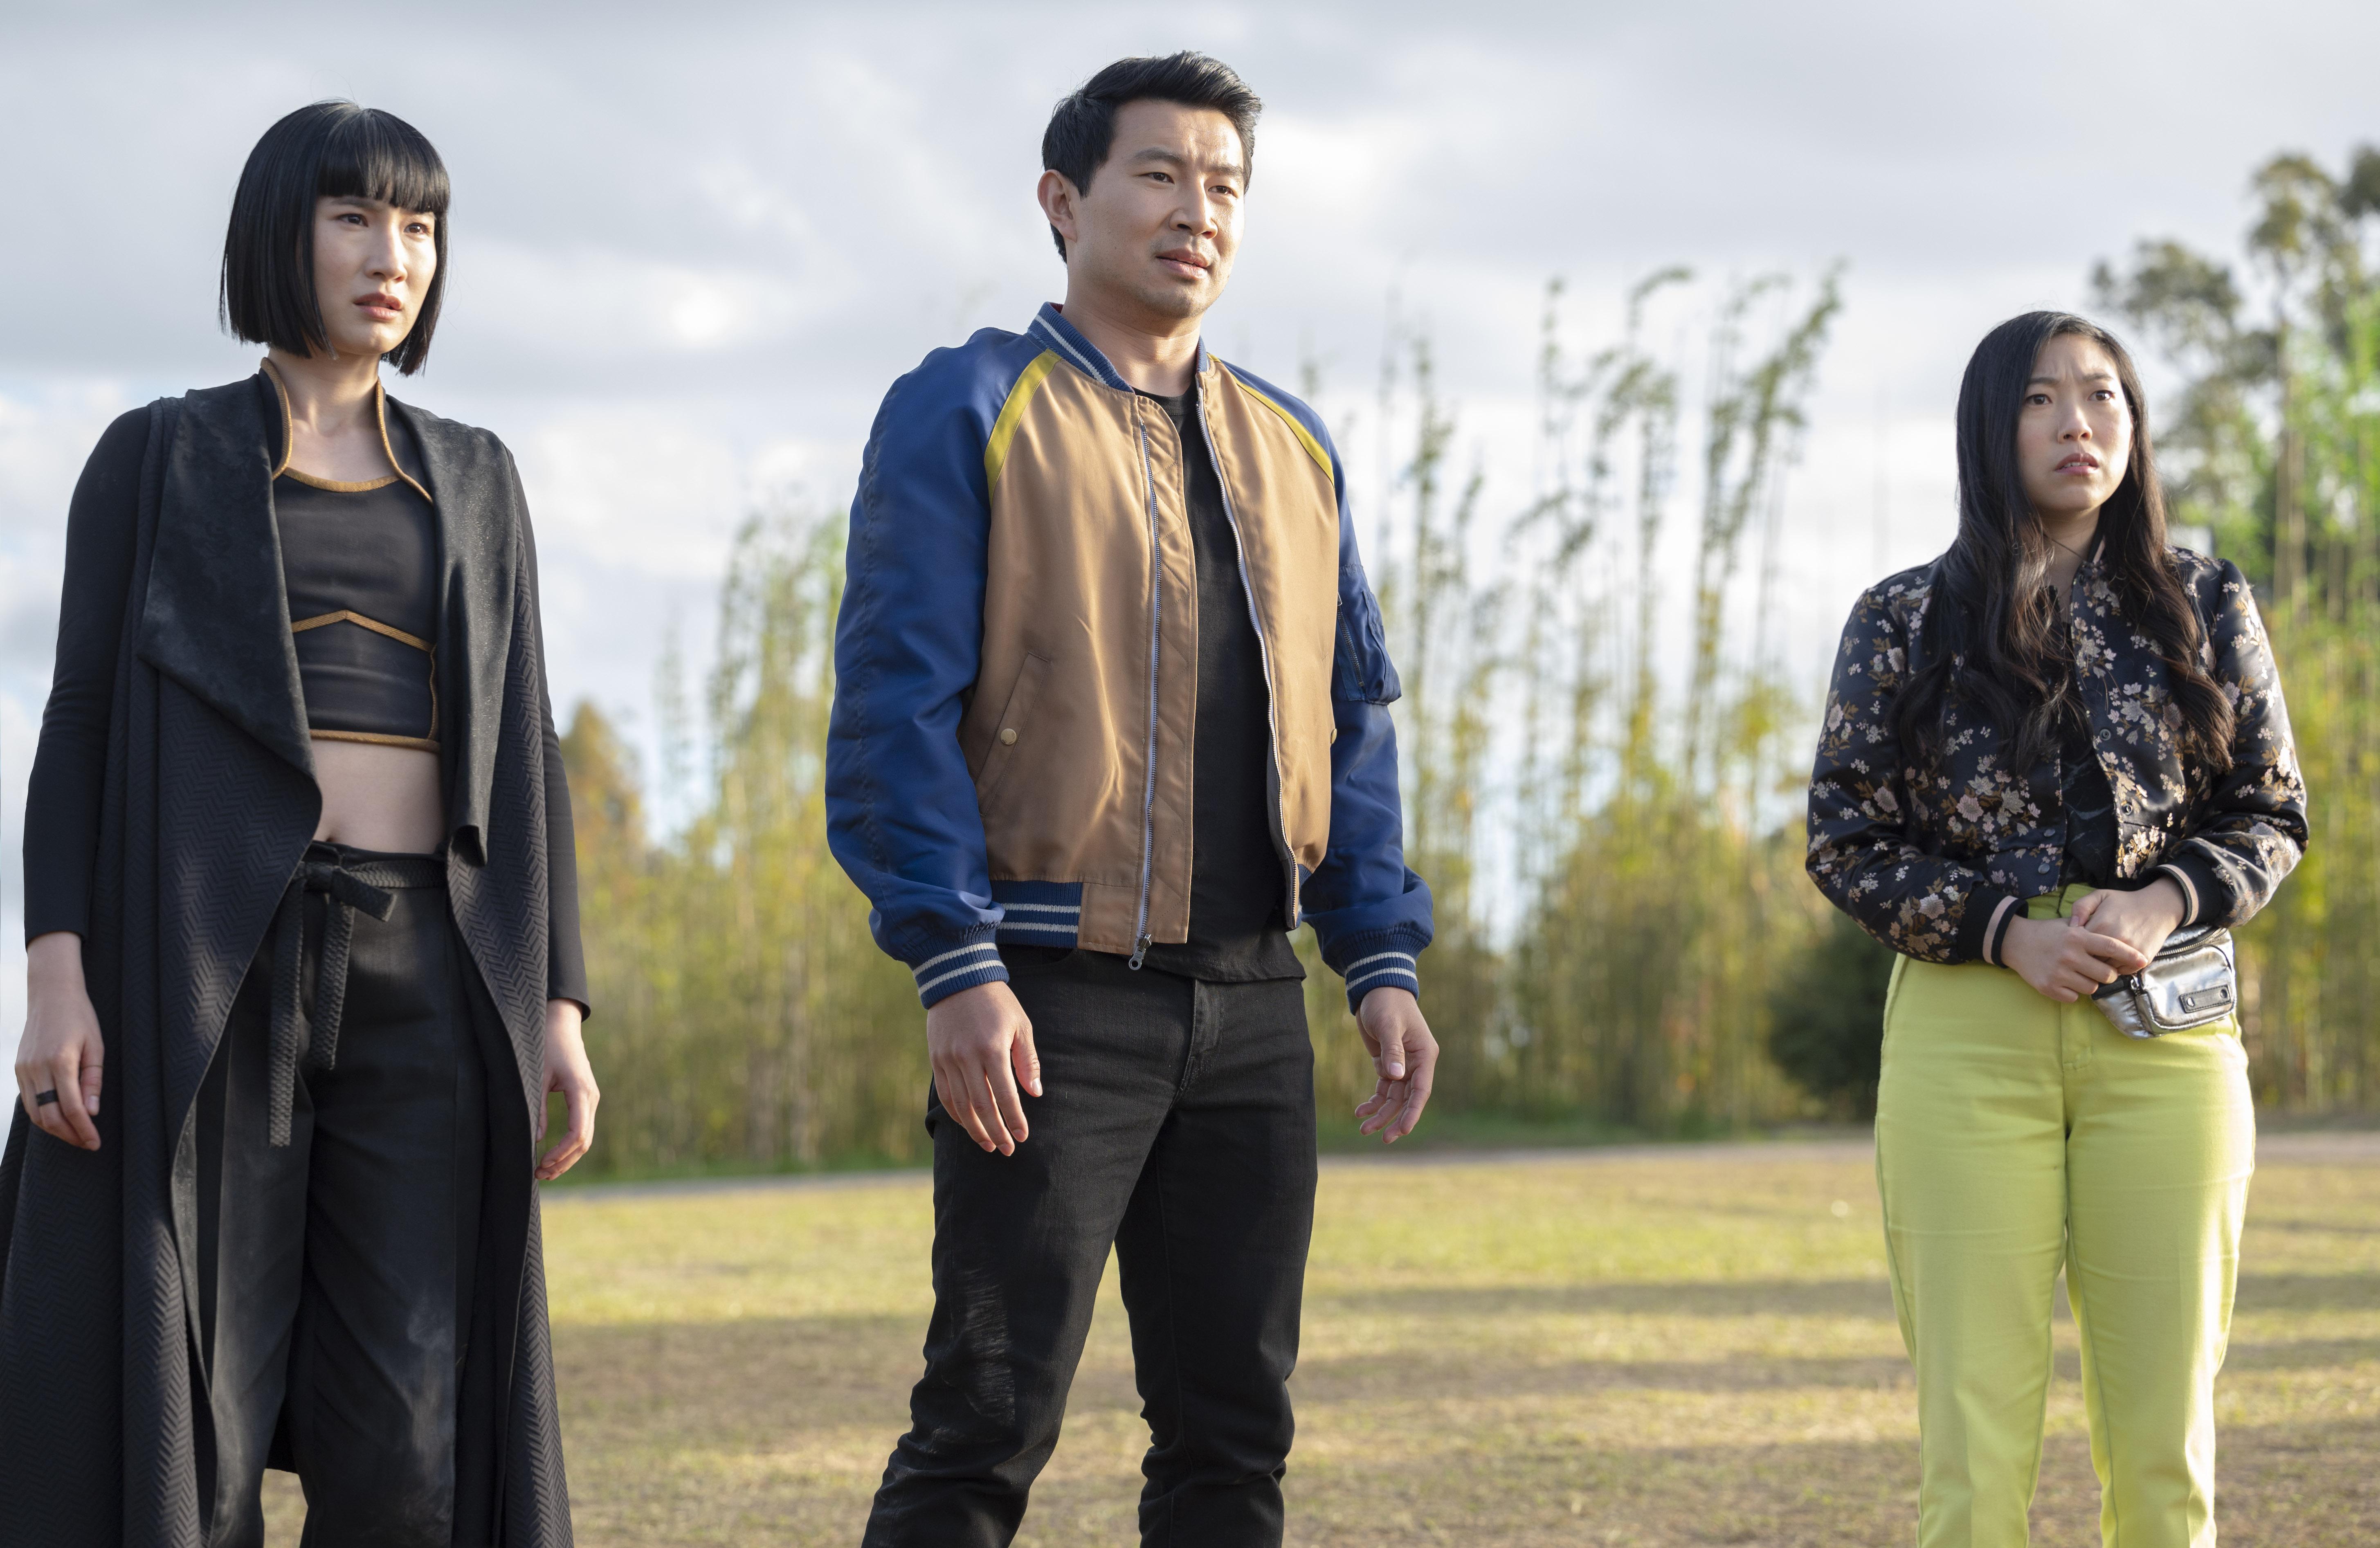 Shang-Chi movie review: Marvel goes fantasy